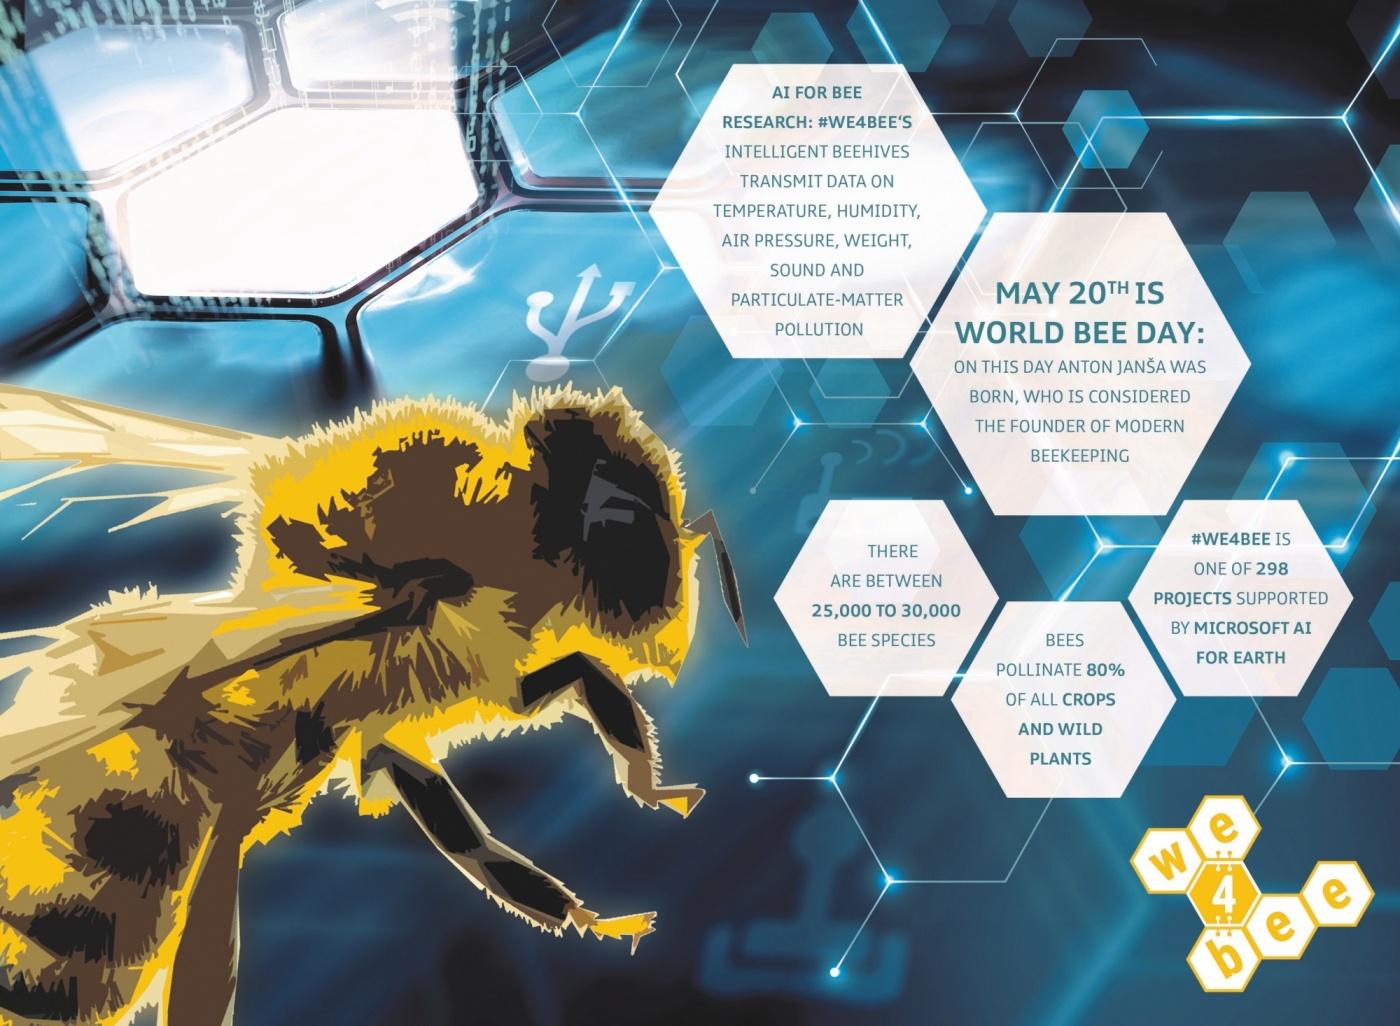 Audi攜手科技大廠 以前瞻科技改造人類未來